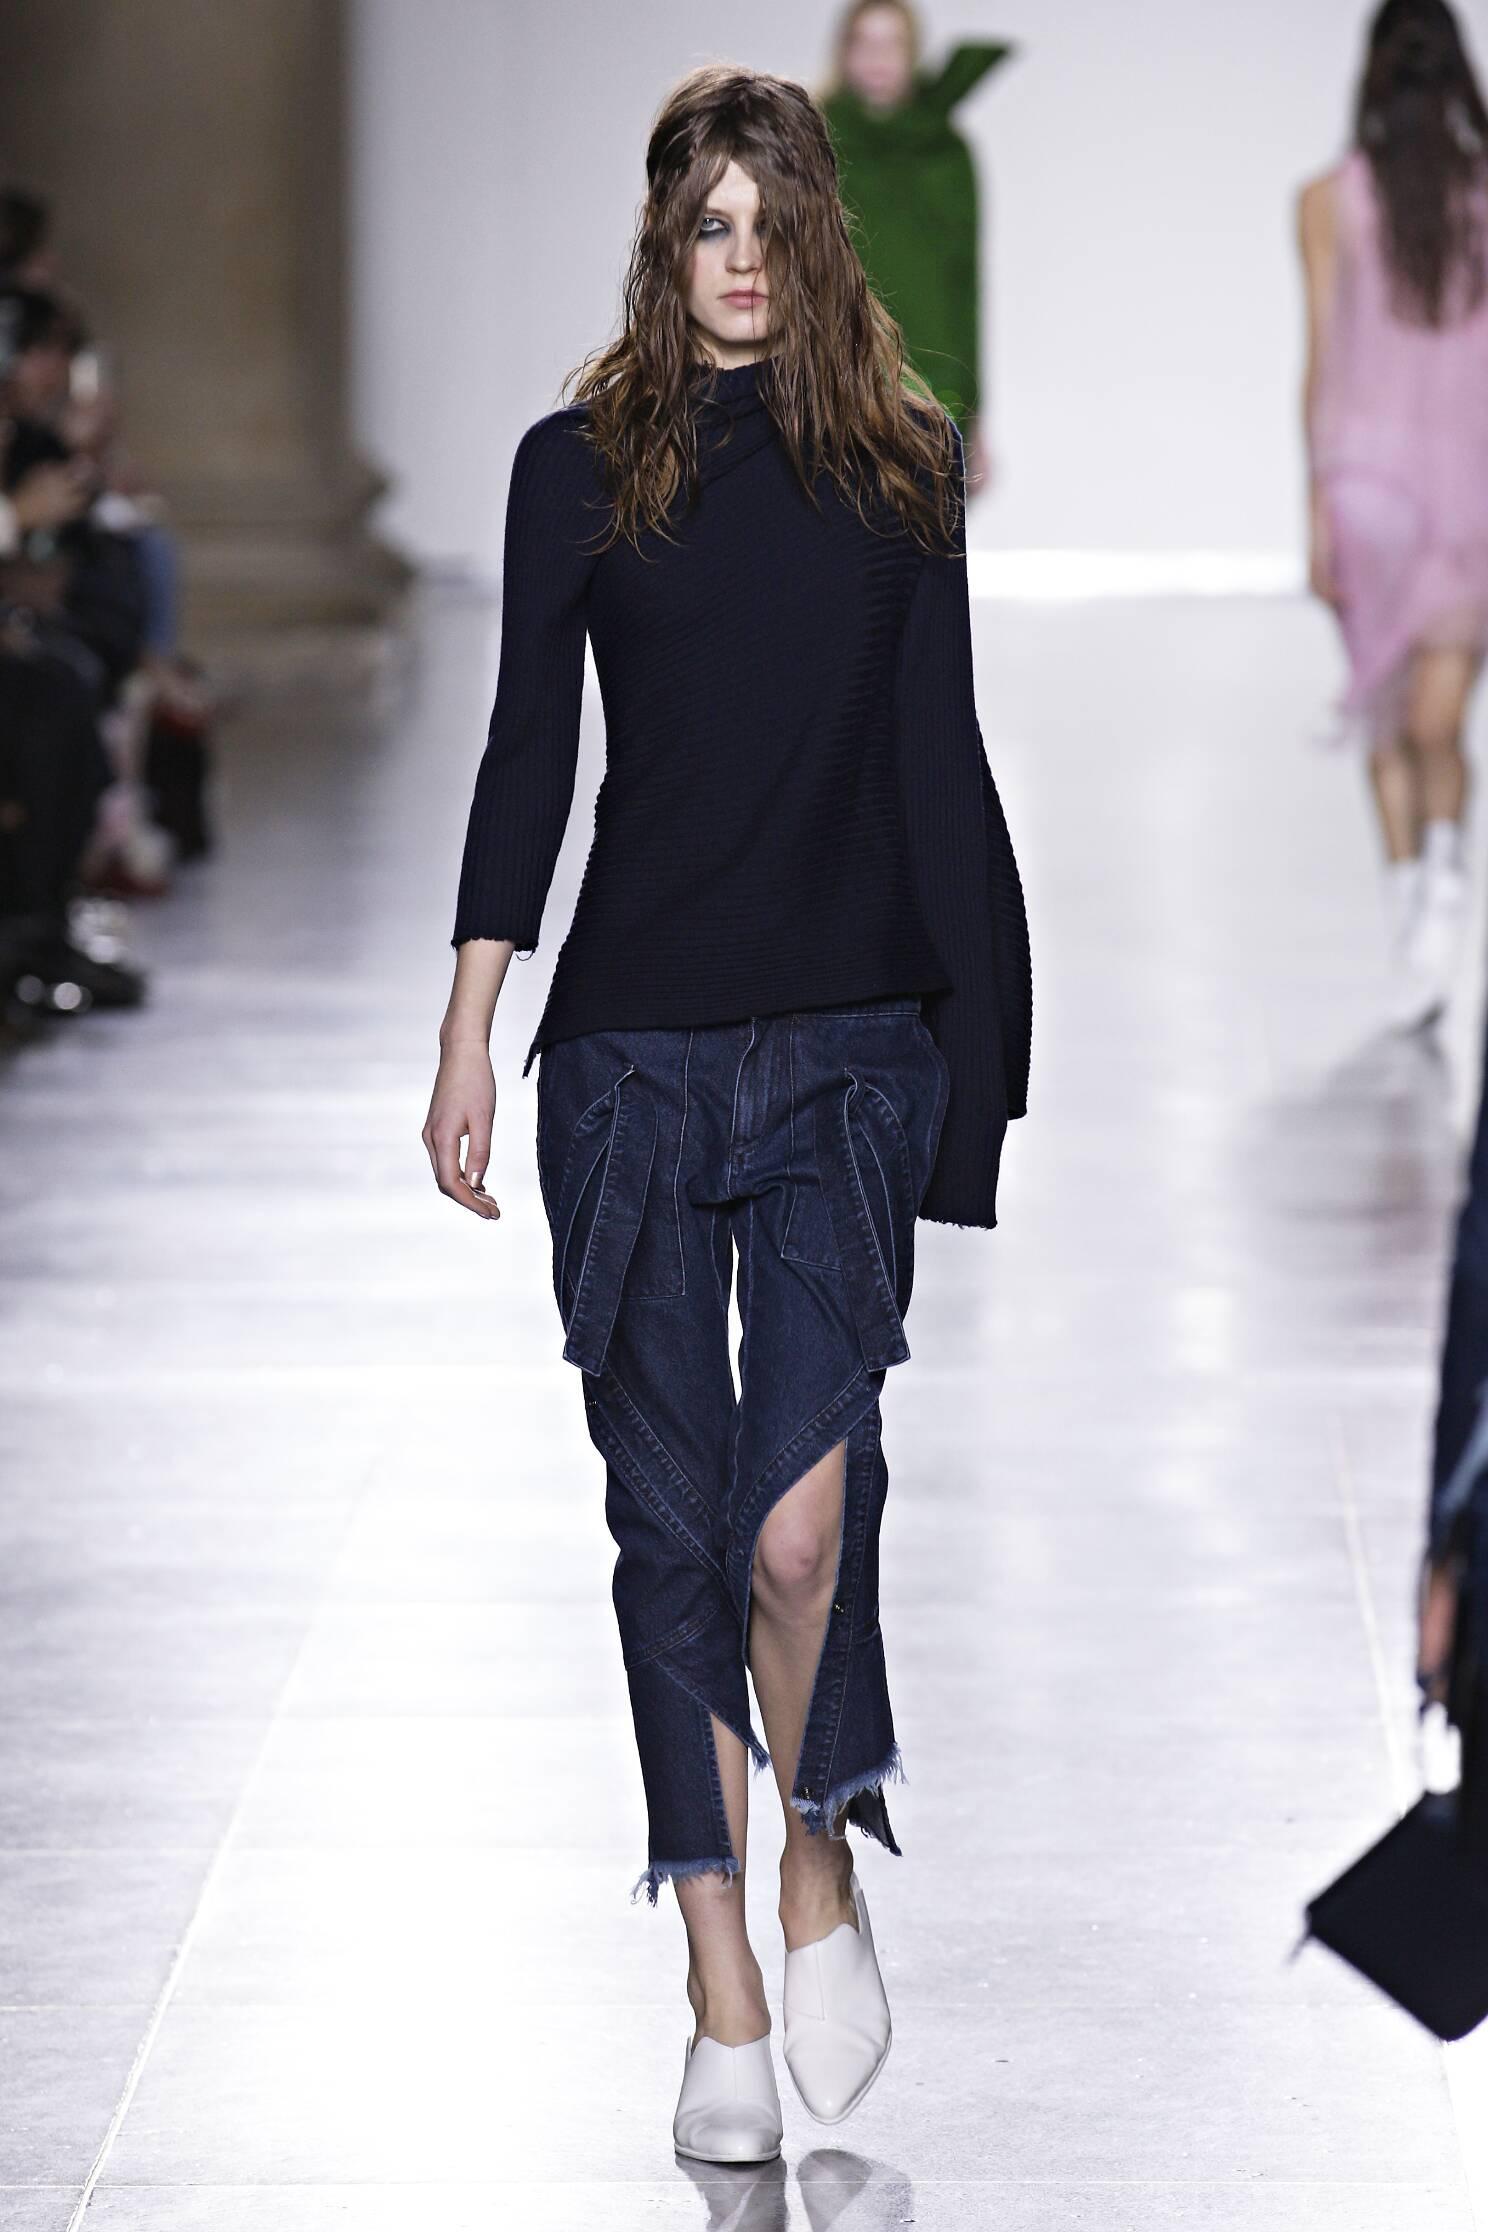 Fall 2015 Fashion Trends Marques Almeida Collection